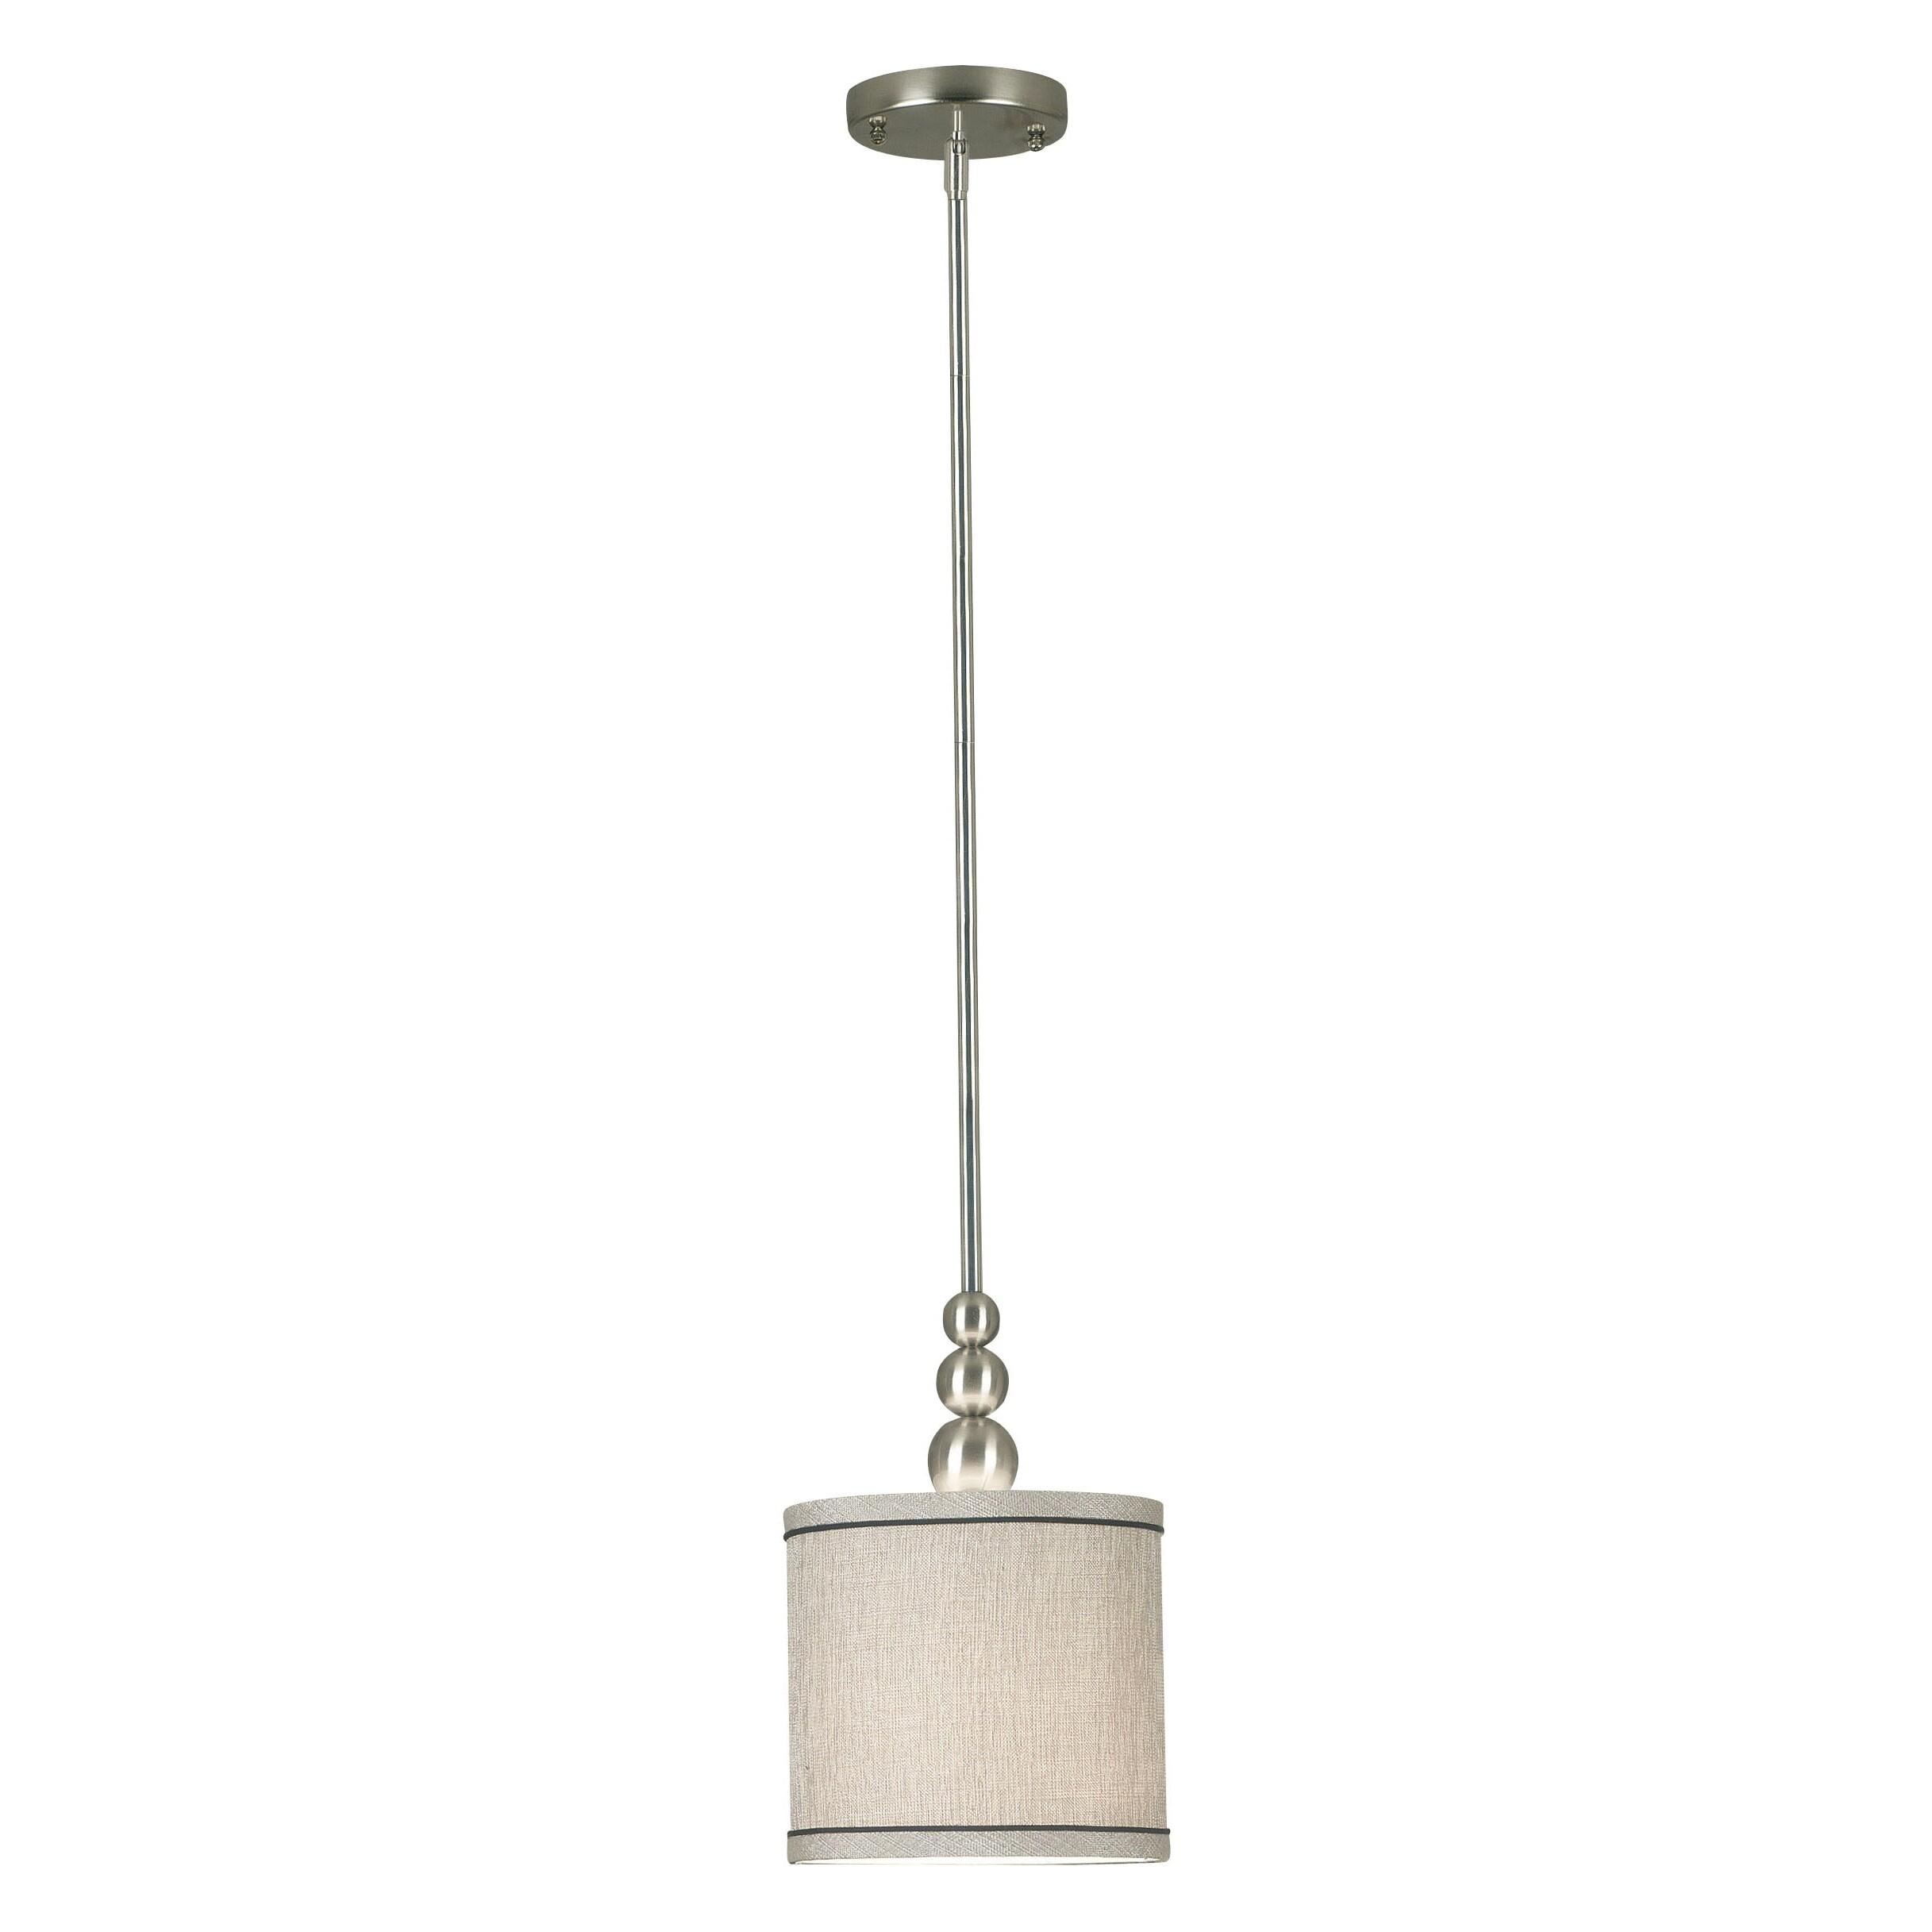 Martha Stewart Living Skylands Collection 17249 Walmart Design Craft Brushed Steel Silver 1 Light Mini Pendant As Is